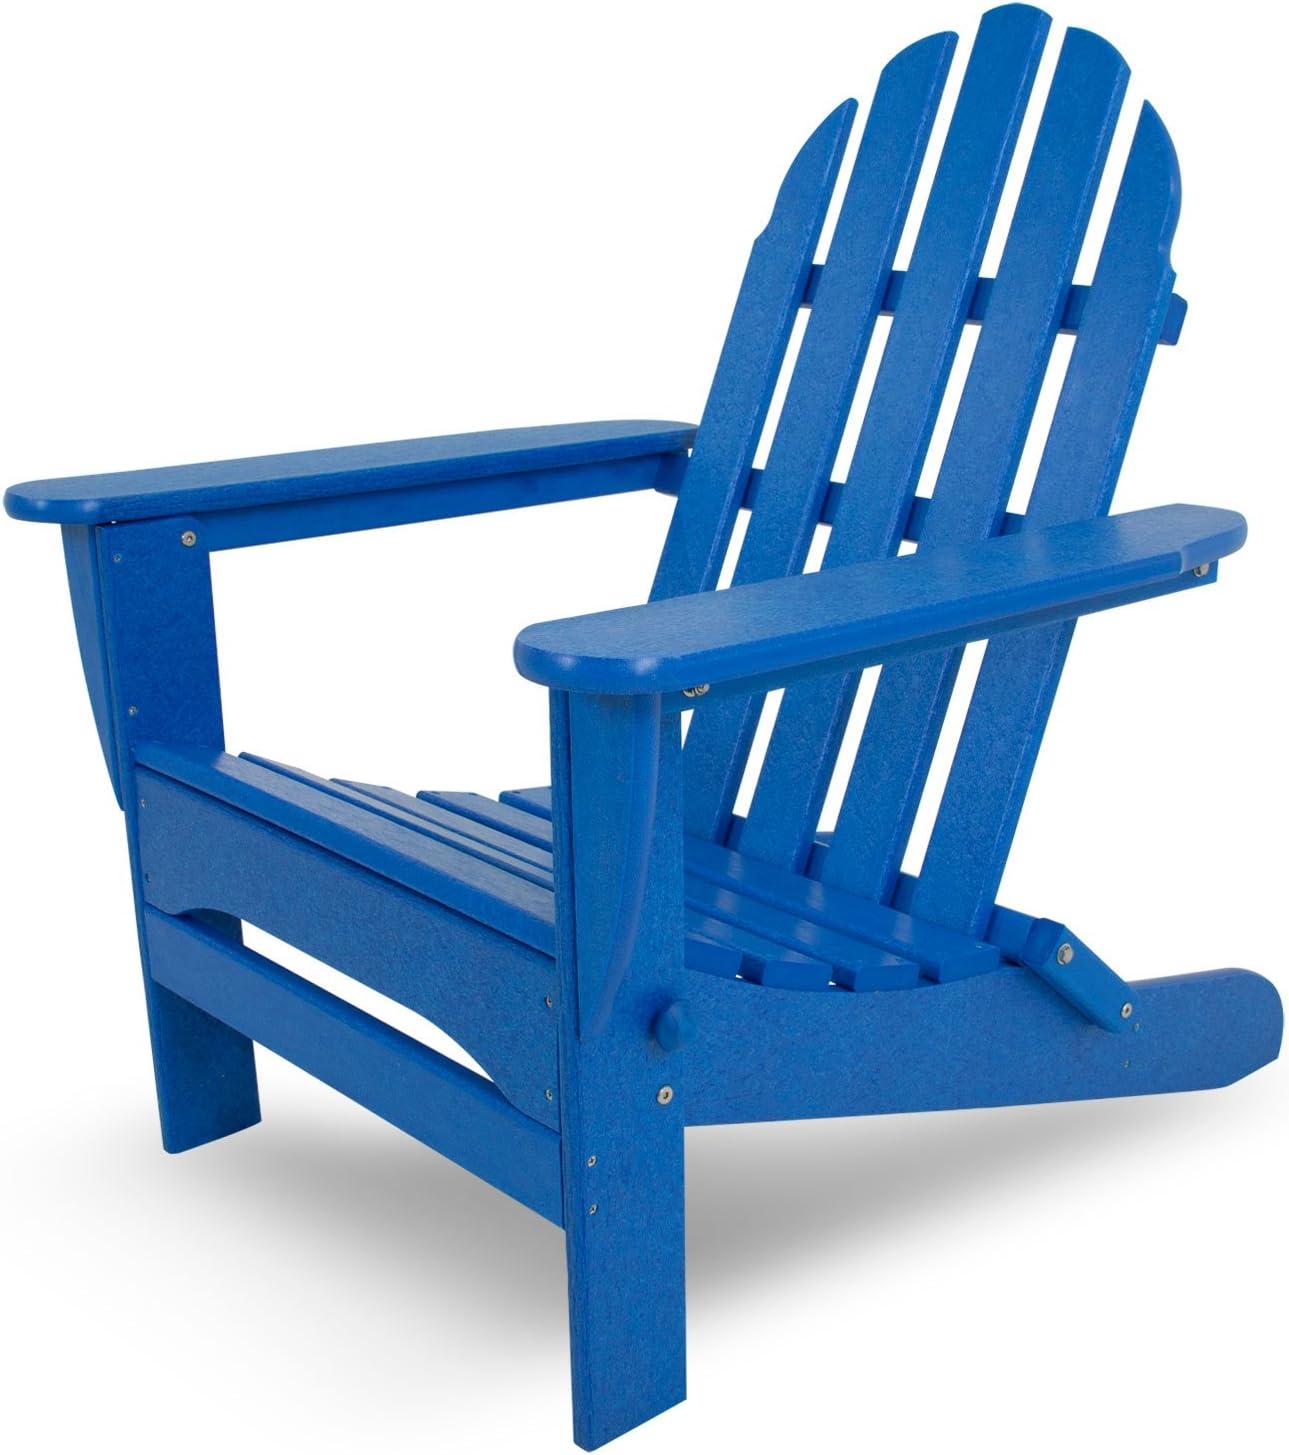 POLYWOOD AD5030PB Classic Folding Adirondack Chair, 35.00